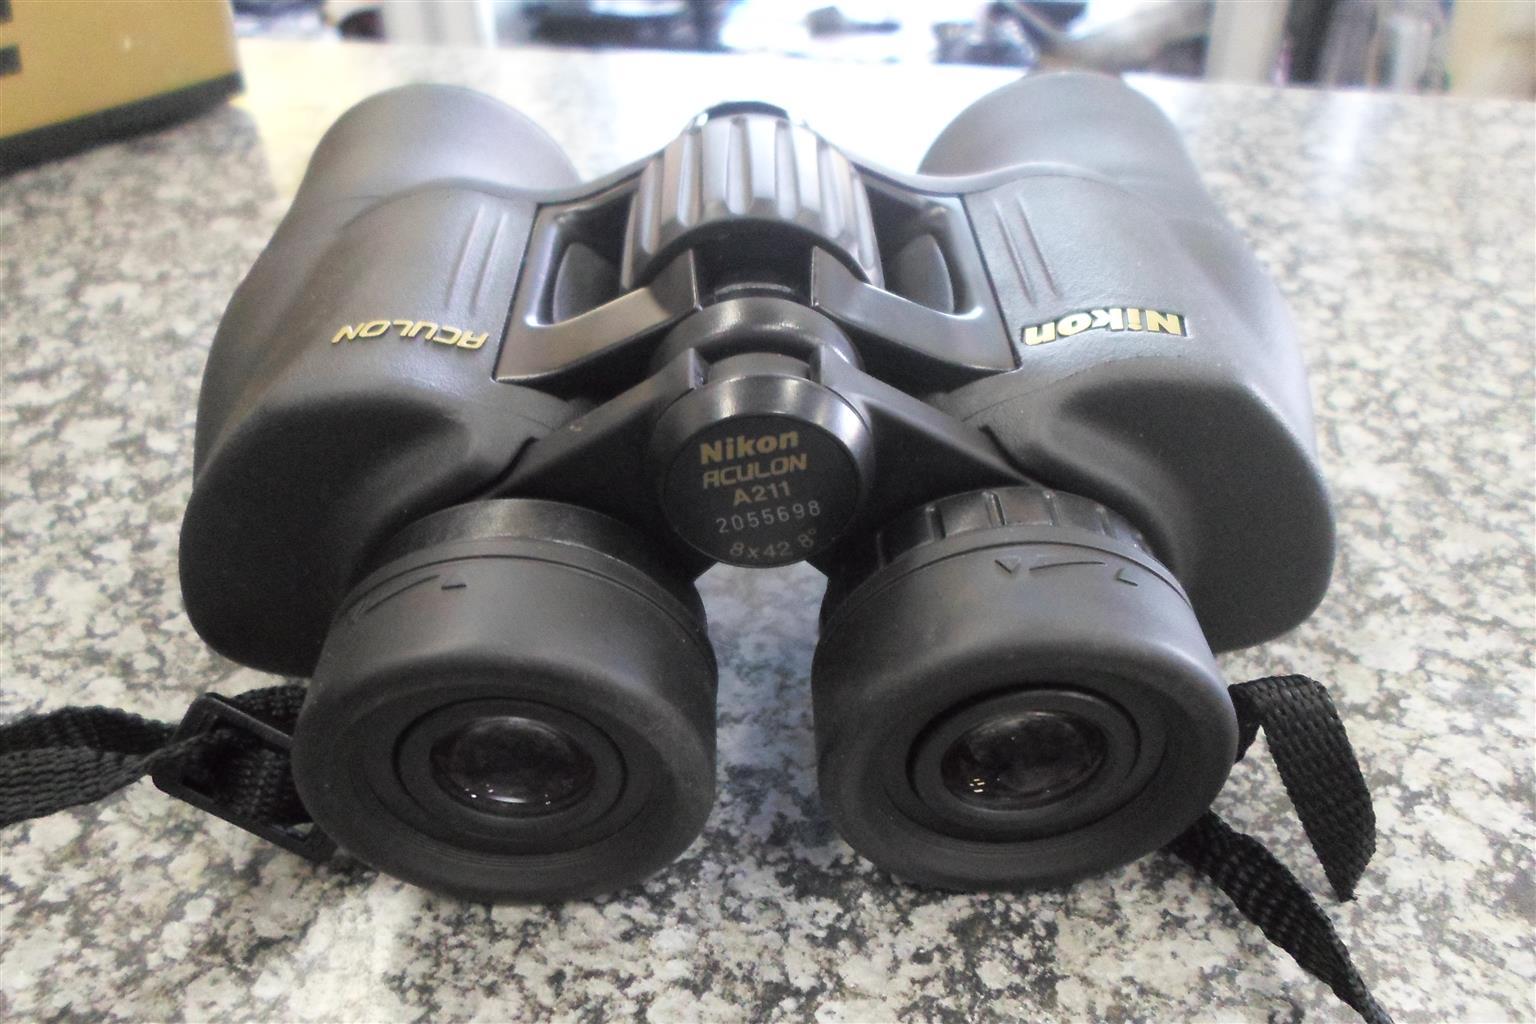 Aculon A211 8x42 Binocular